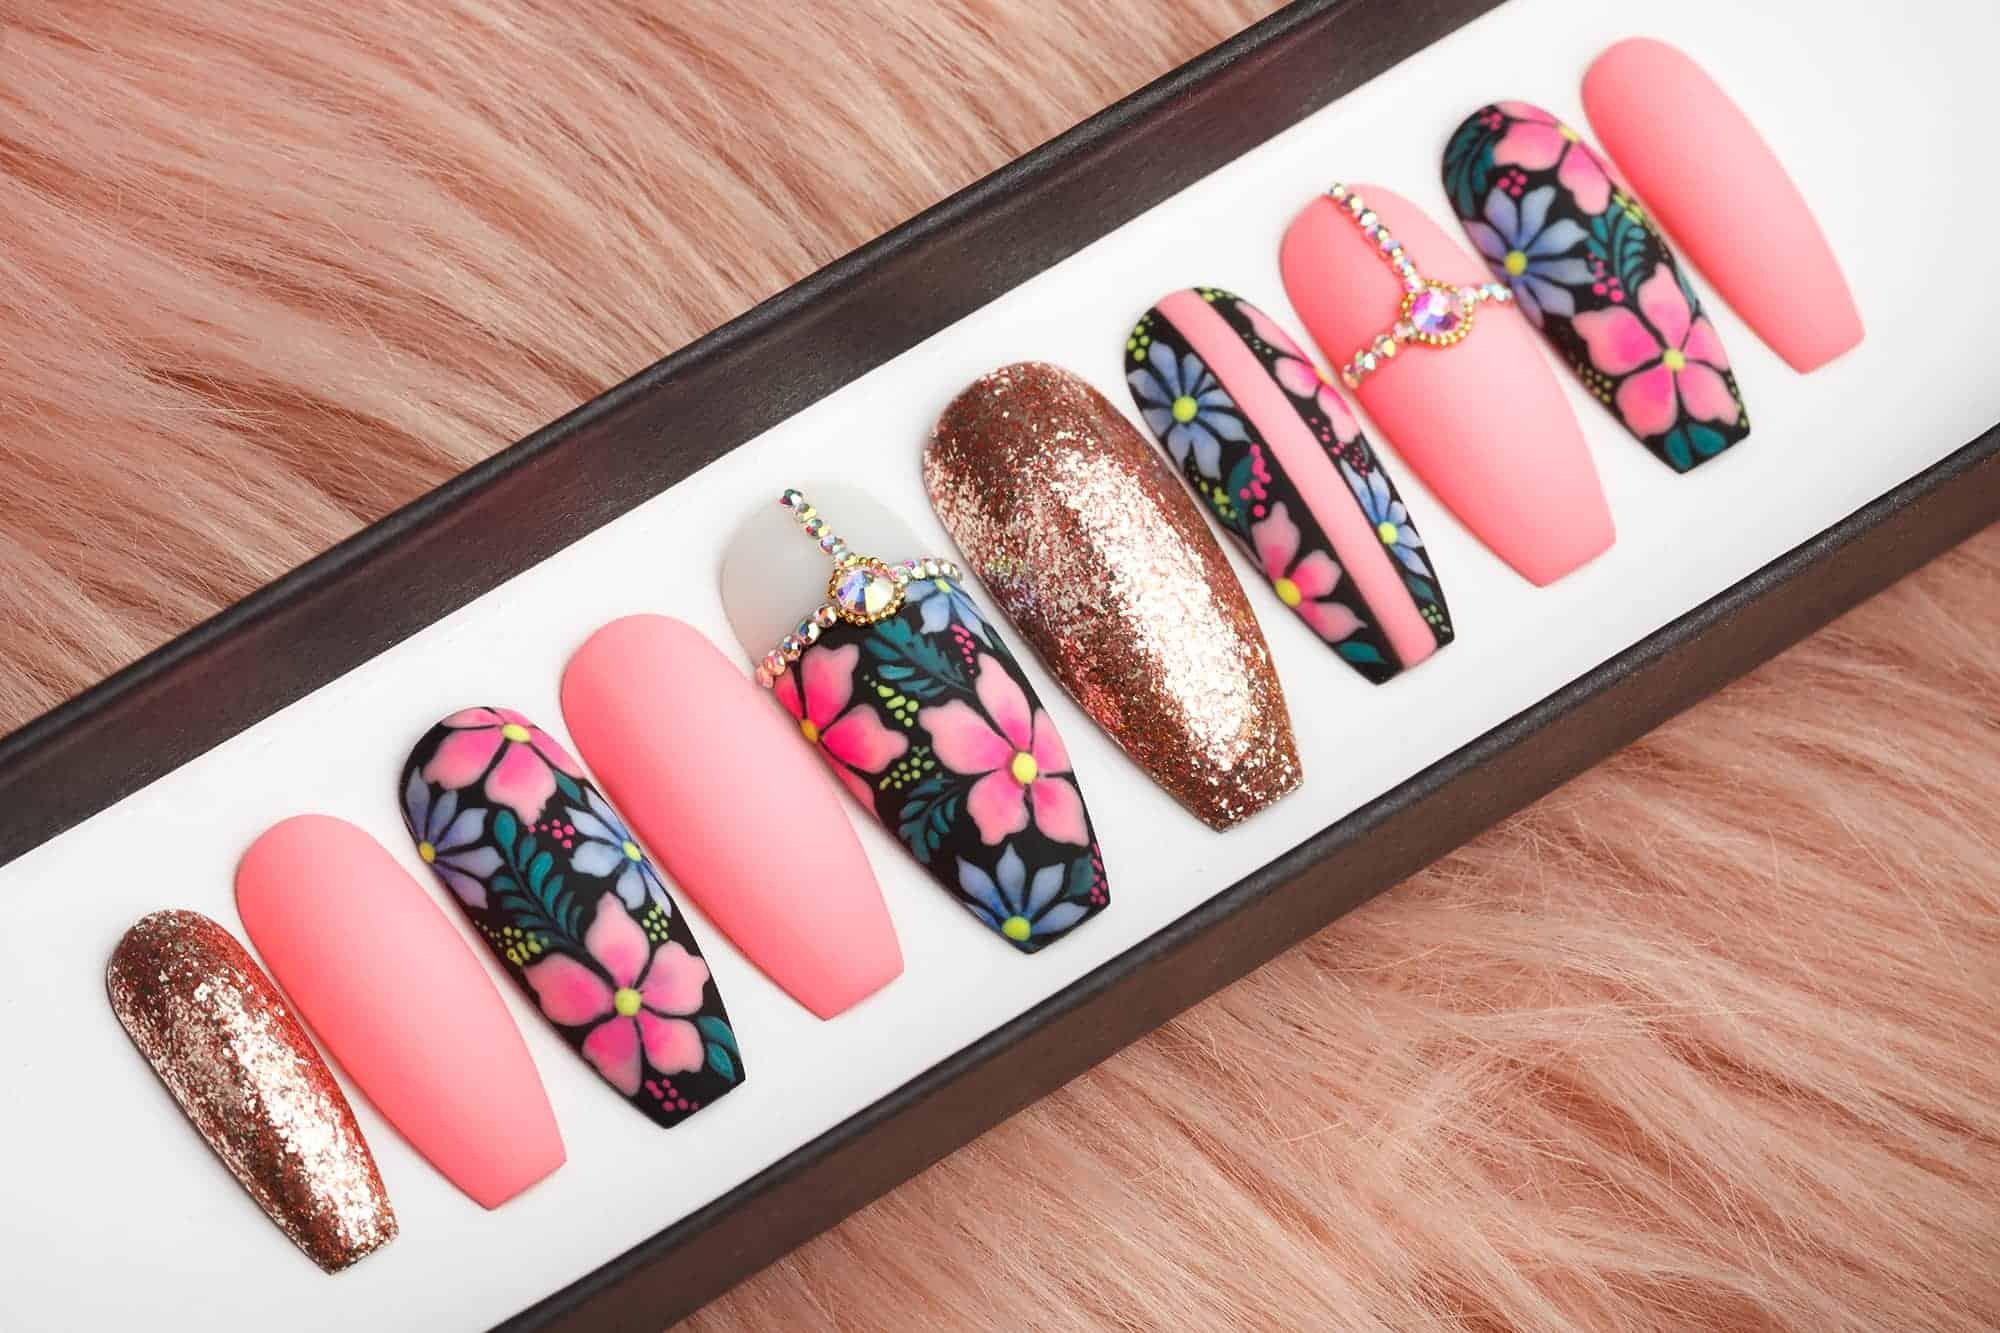 Summer Night Press on Nails with Swarovski Crystals • Fake Nails • False Nails • Glue On Nails • Flowers on nails